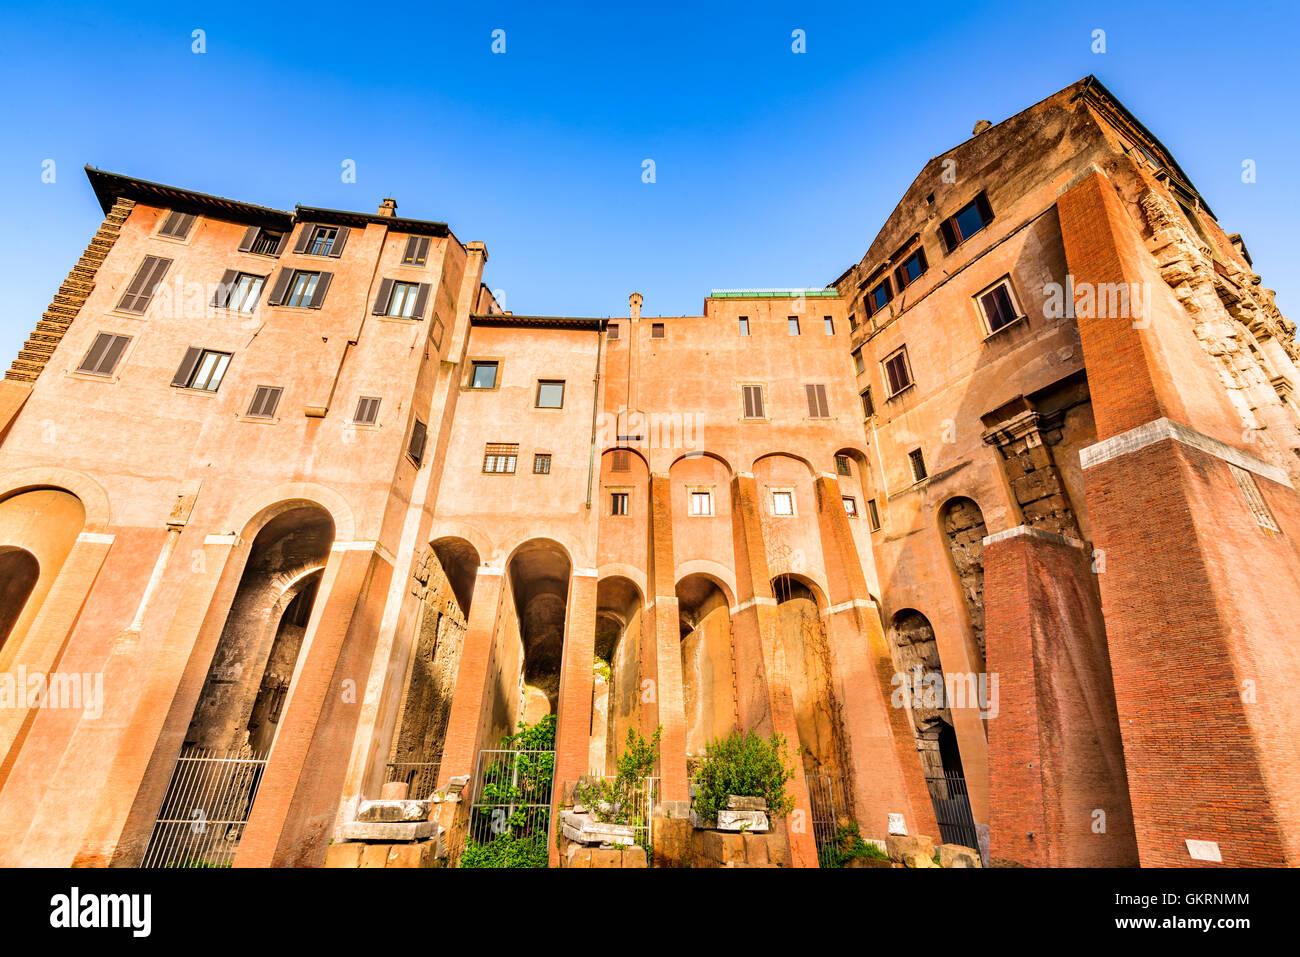 Rome, Italy. Morning  view to the Theatre of Marcellus (Italian: Teatro di Marcello) built in early Roman Republic. - Stock Image